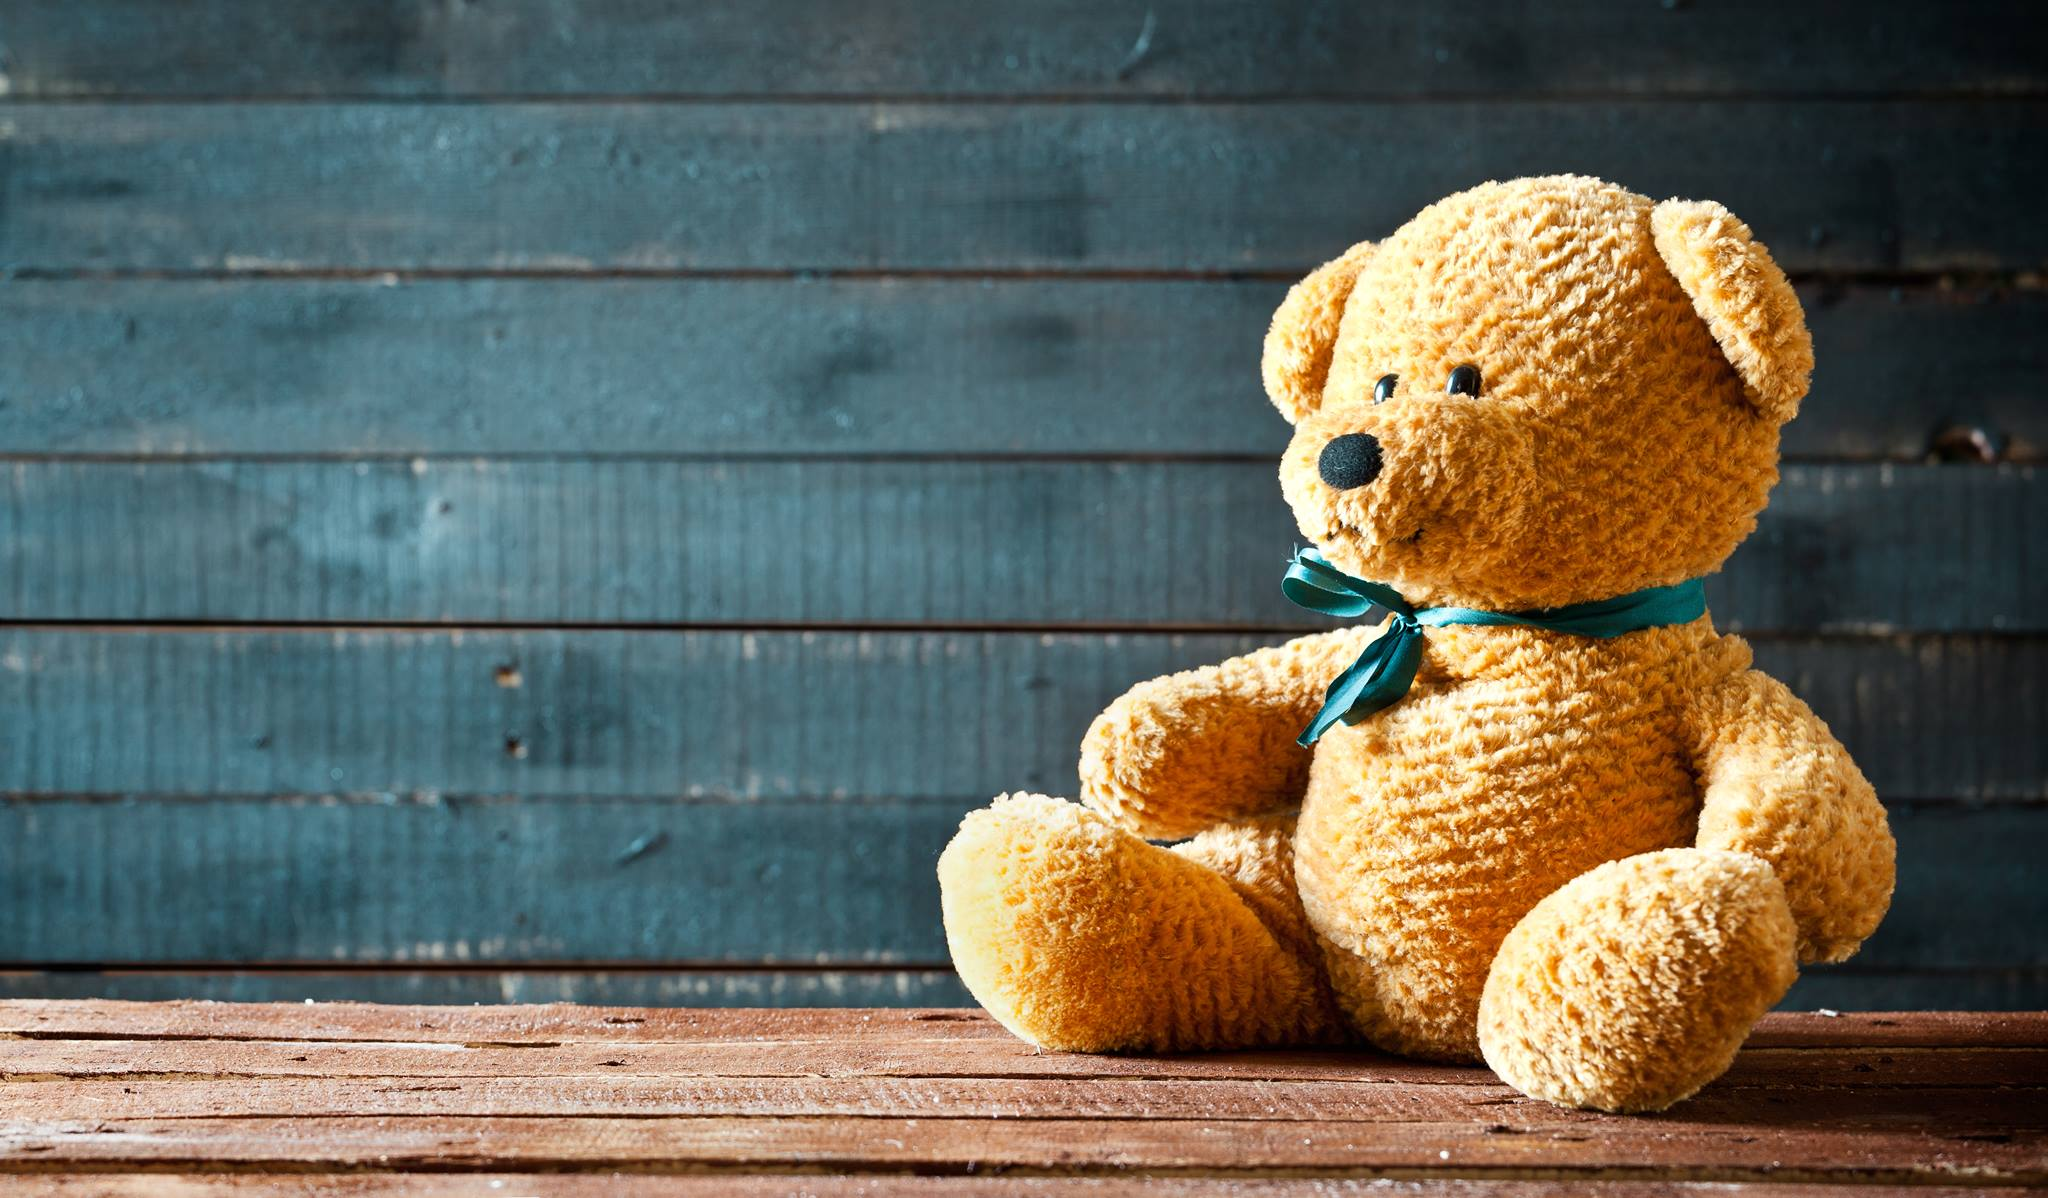 Teddy Bear Picnic Worksheet